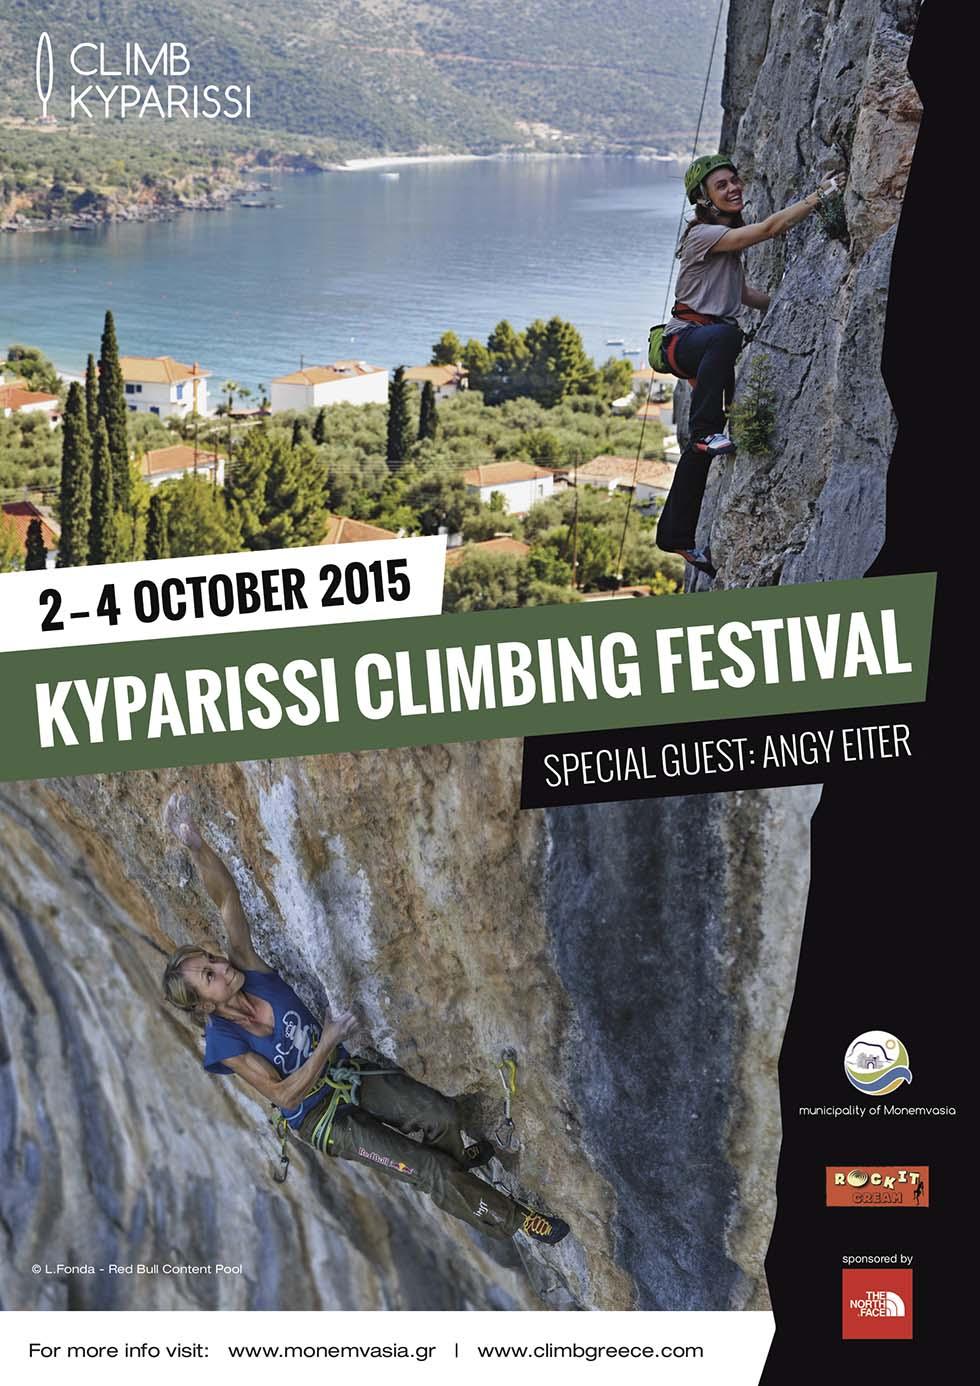 Kyparissi-Festival-Poster-Final-Top